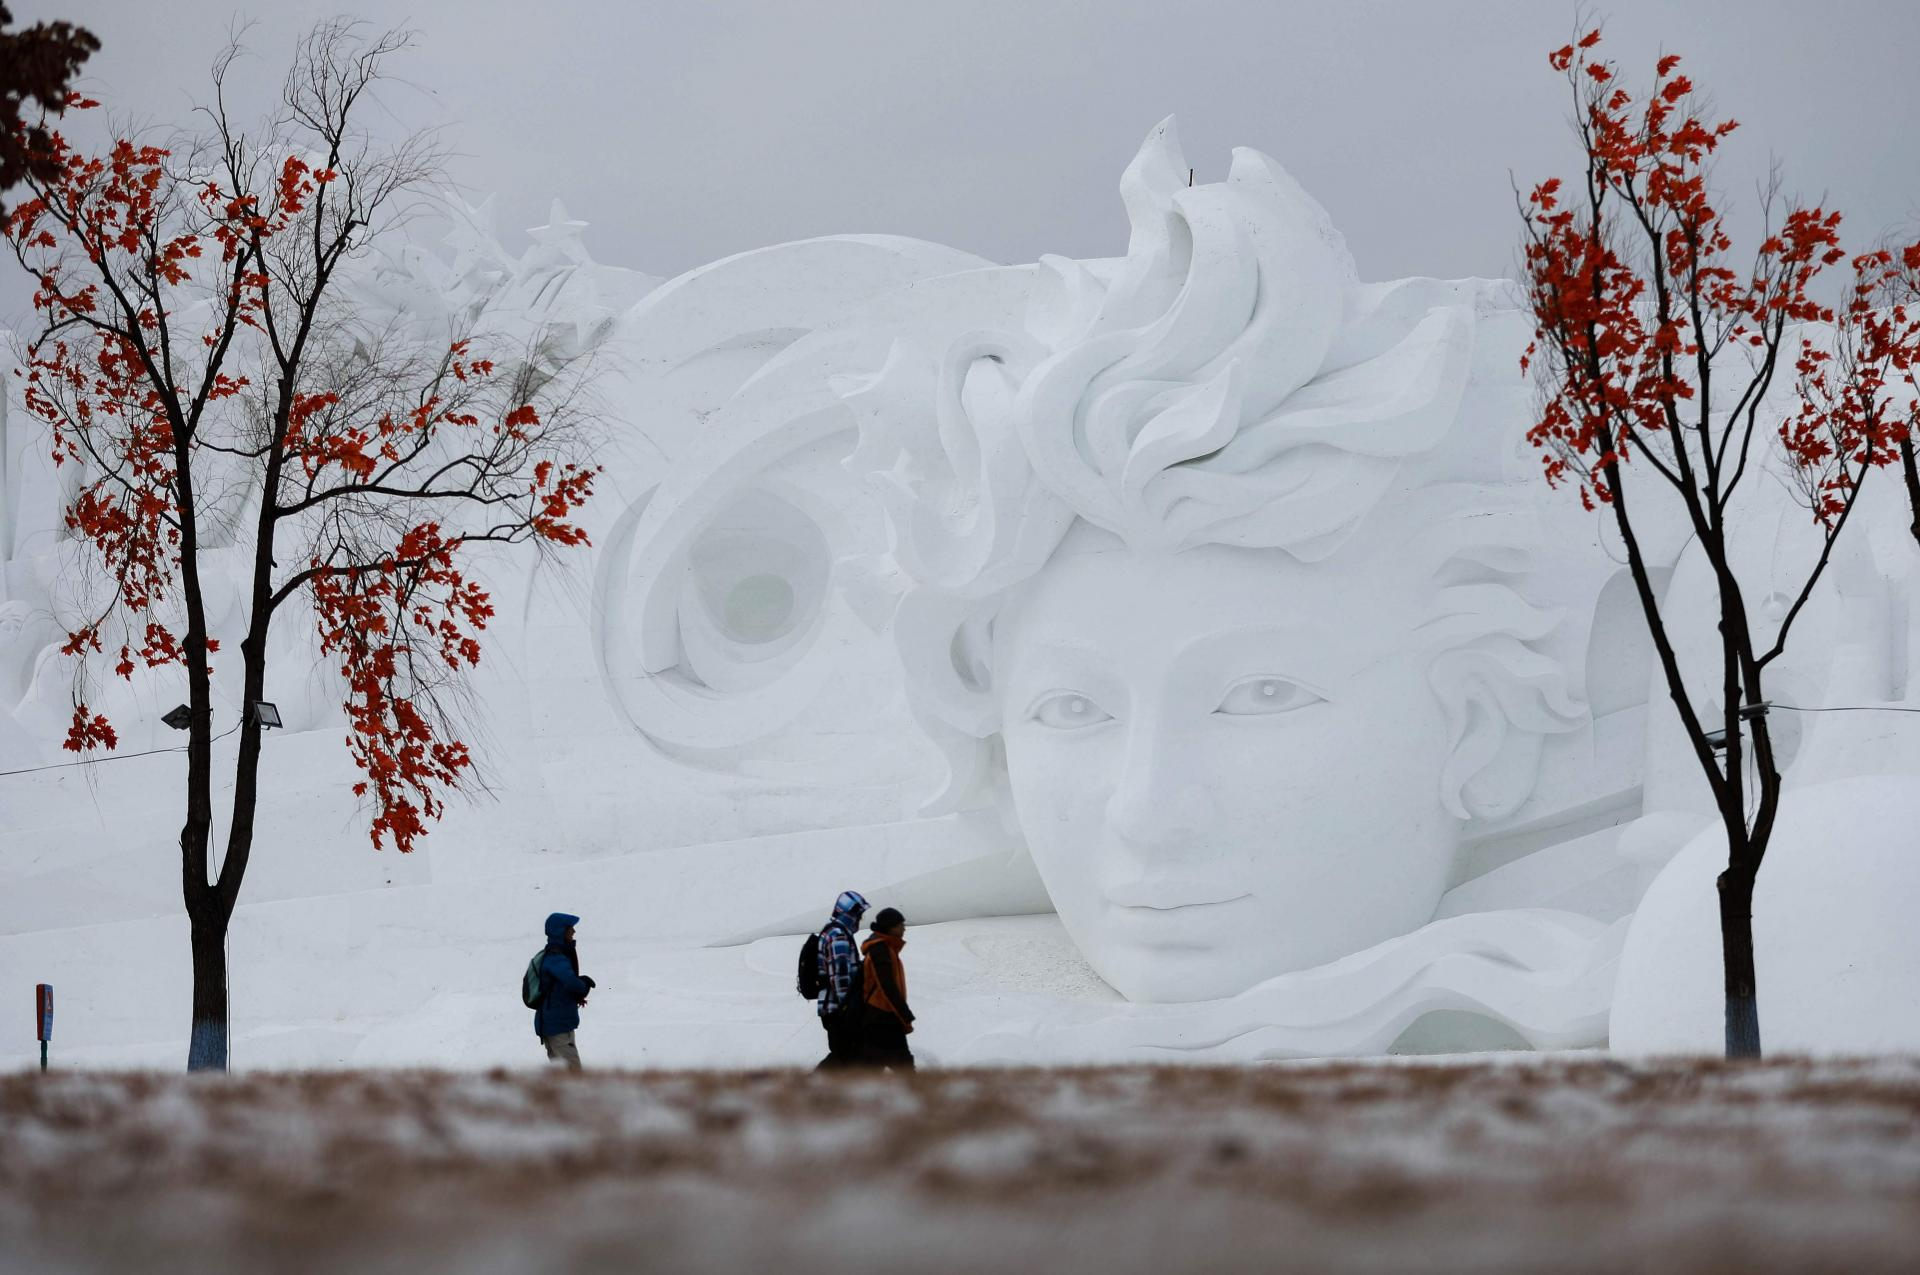 В китайском Харбине началась выставка ледяных скульптур